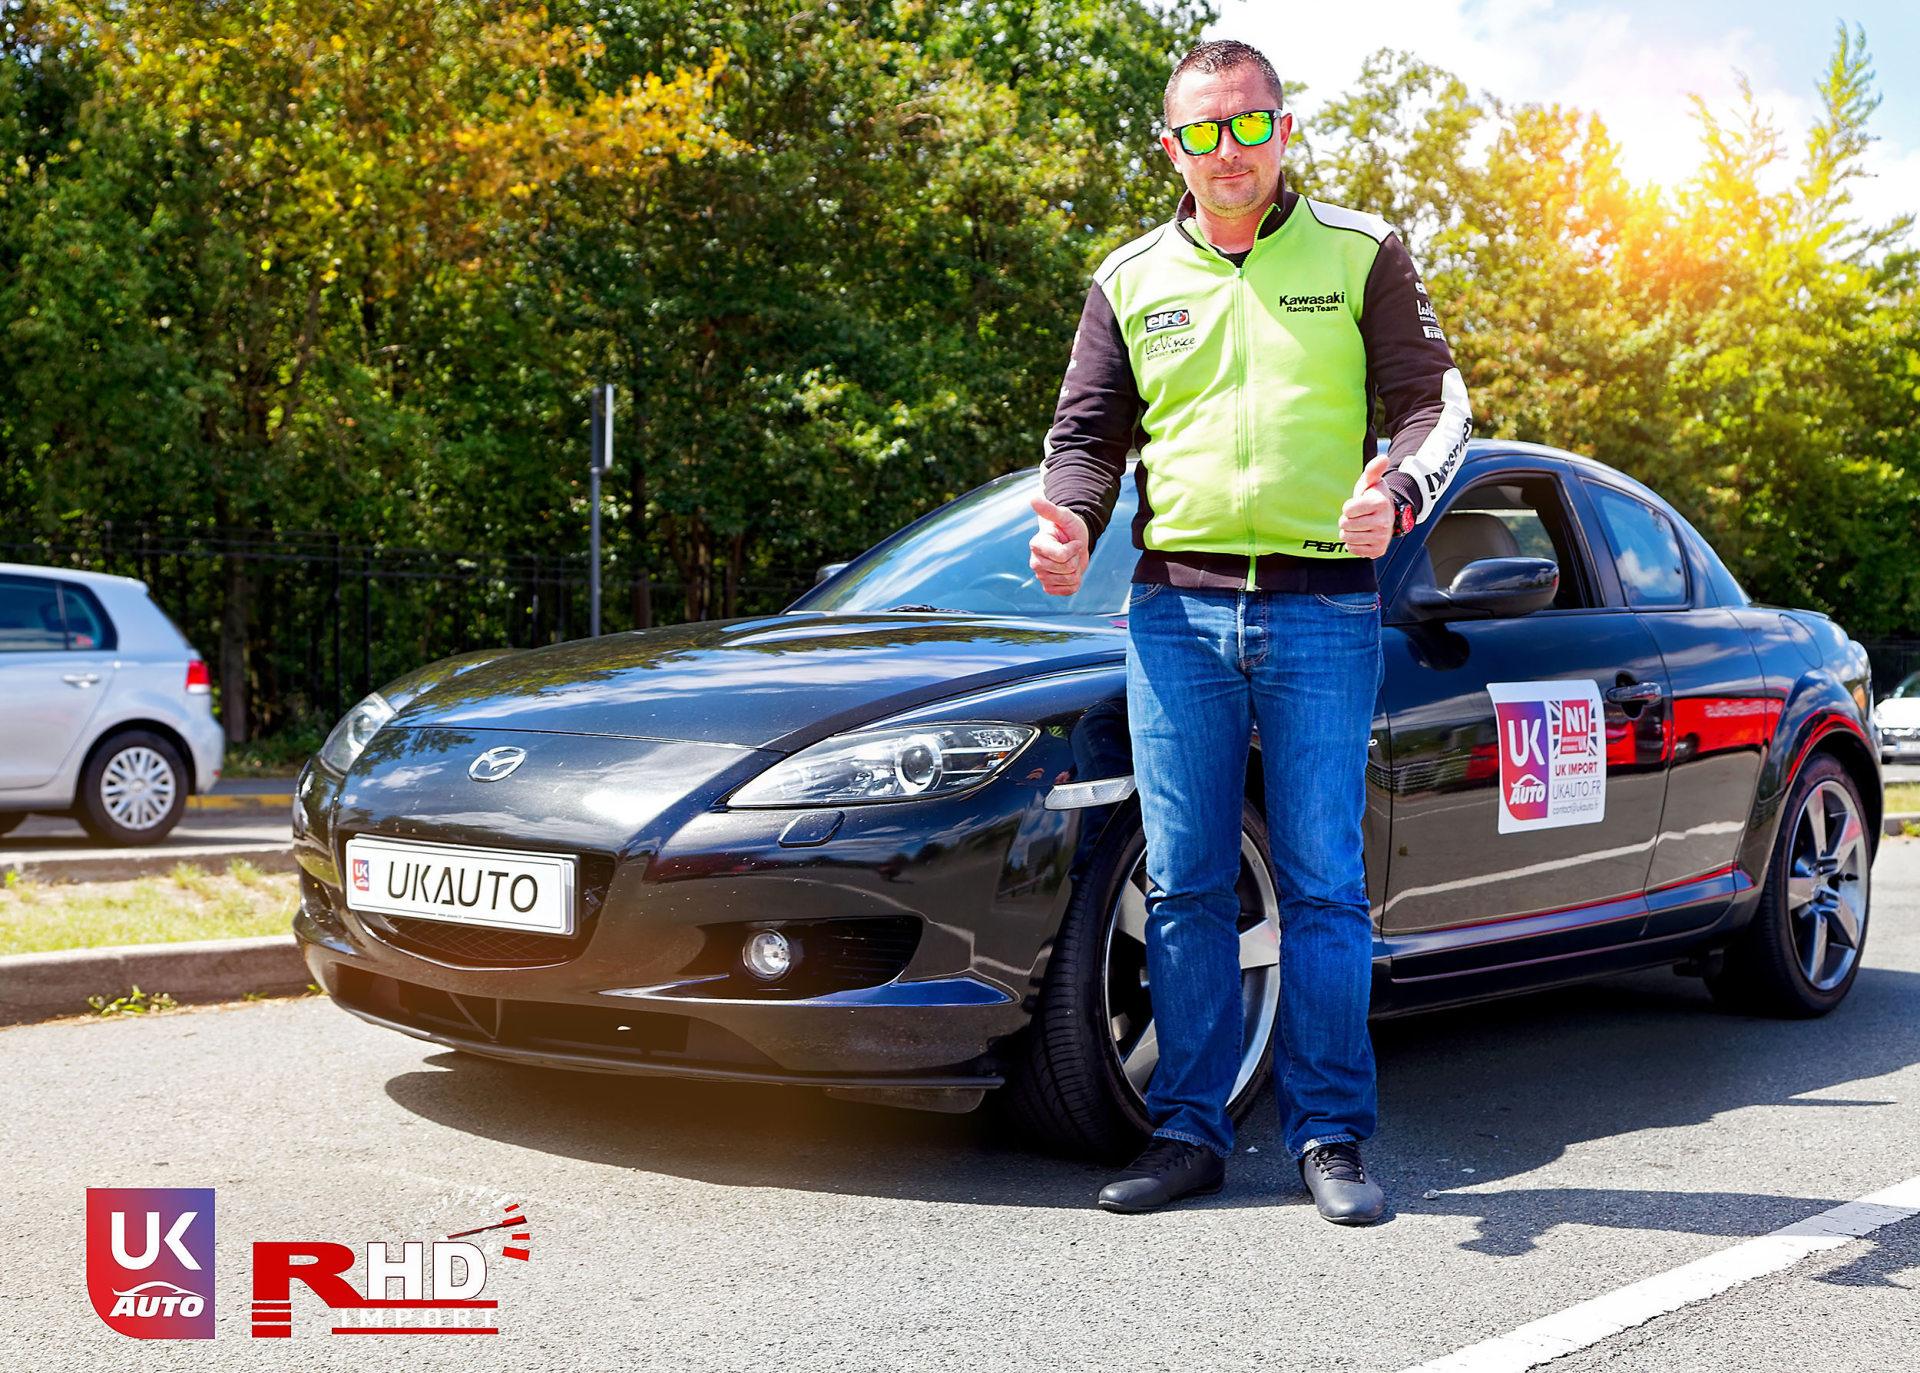 Mazda RX8 Rotary mazda angleterre mazda uk RX8 KURO import uk rhd15 DxO - Import Mazda RX8 KURO ROTARY depuis Autotrader par UKAUTO site annonces UK rhd Felicitation a Dimitri